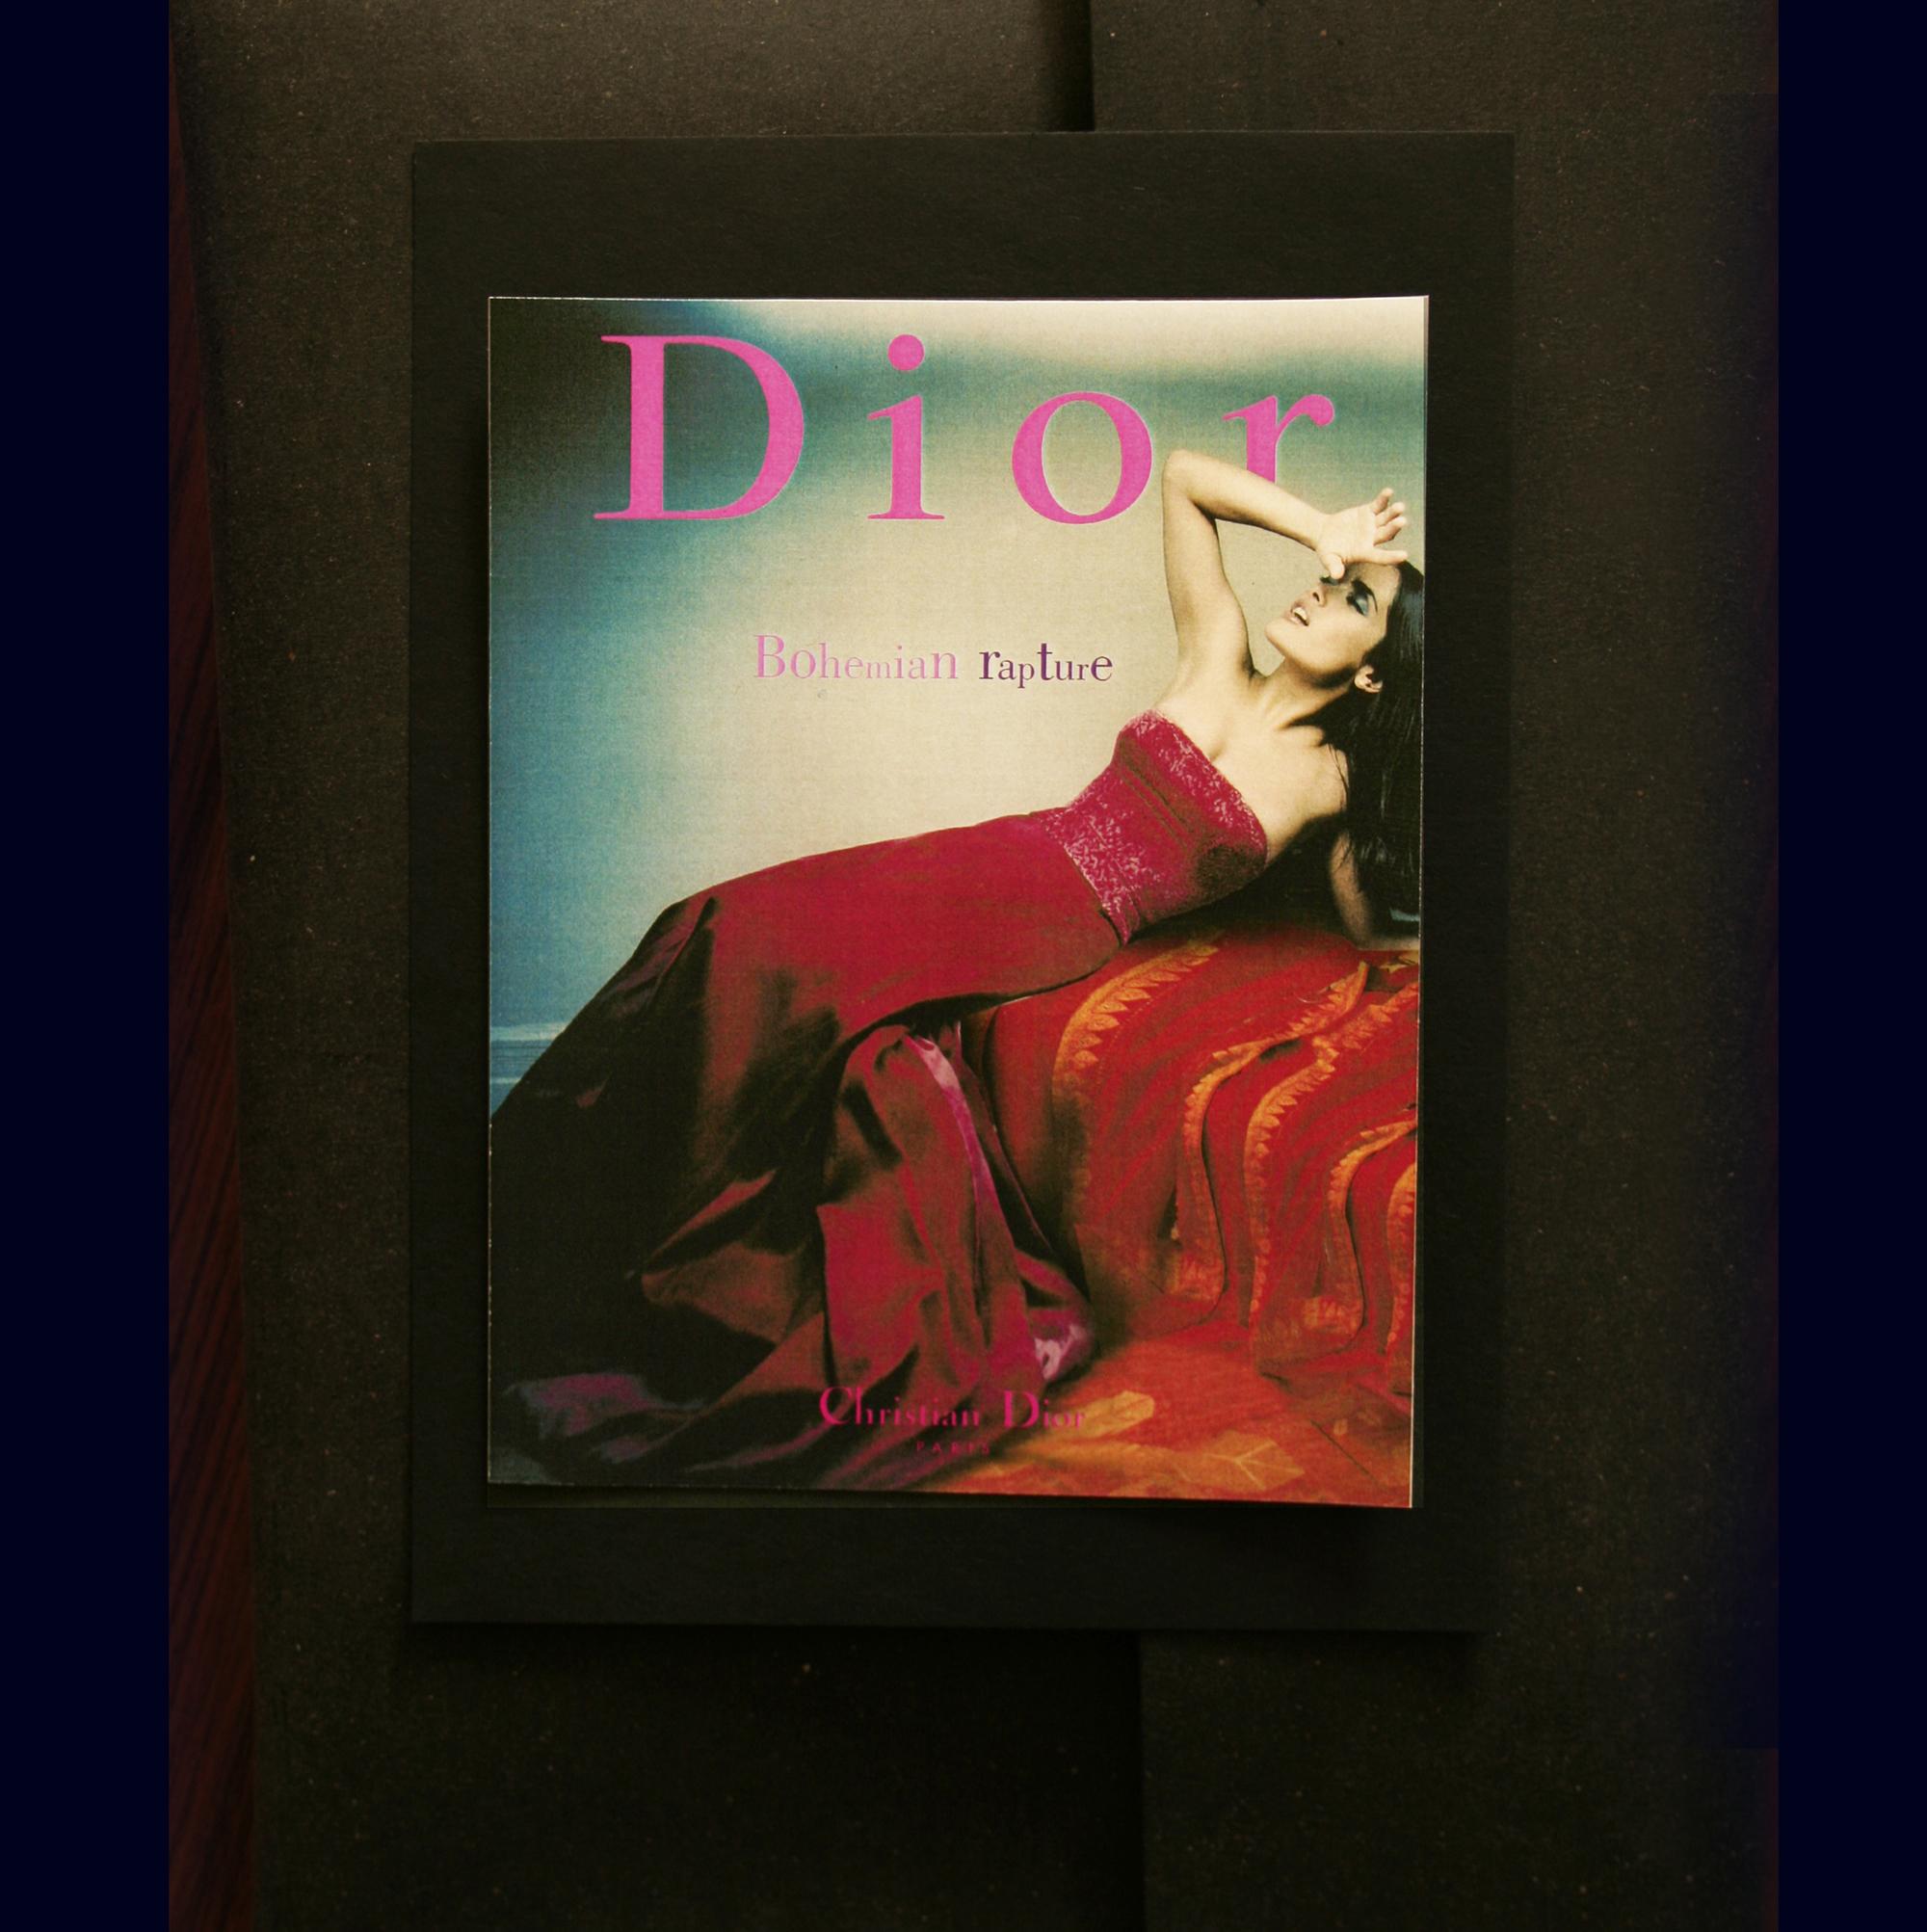 Fragance Dior